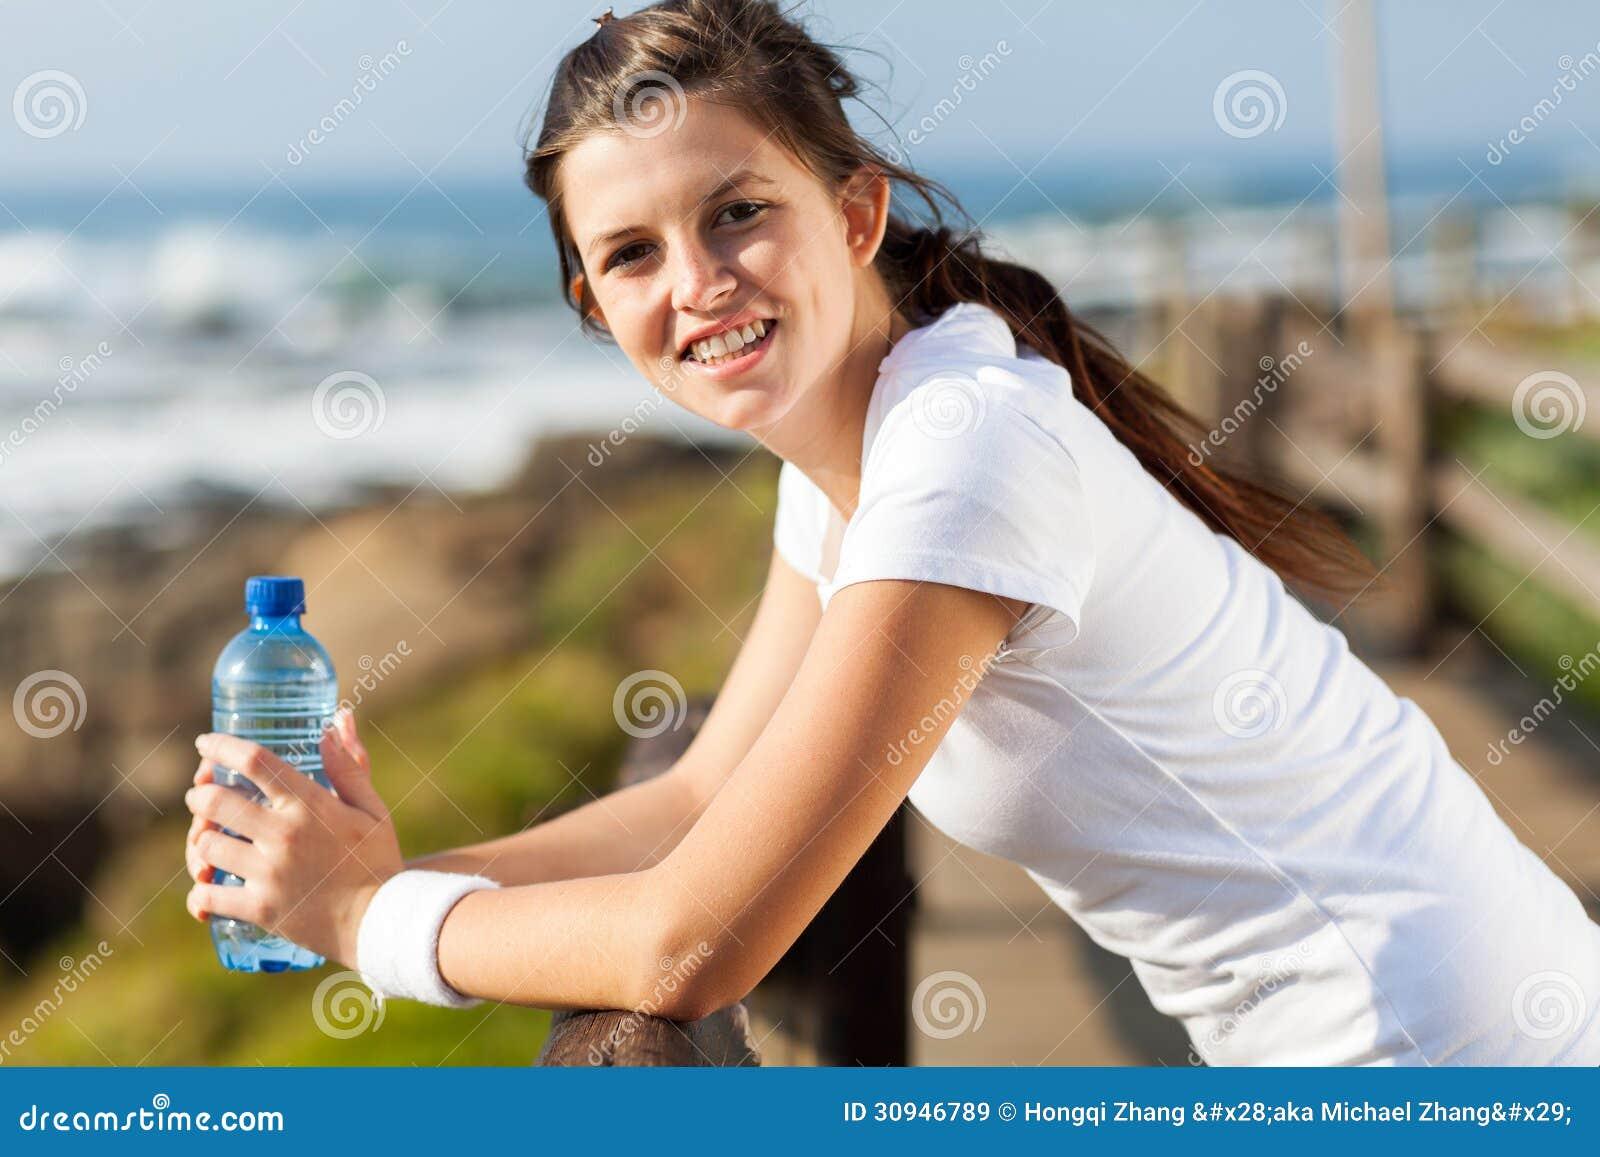 Teen Exercise 27